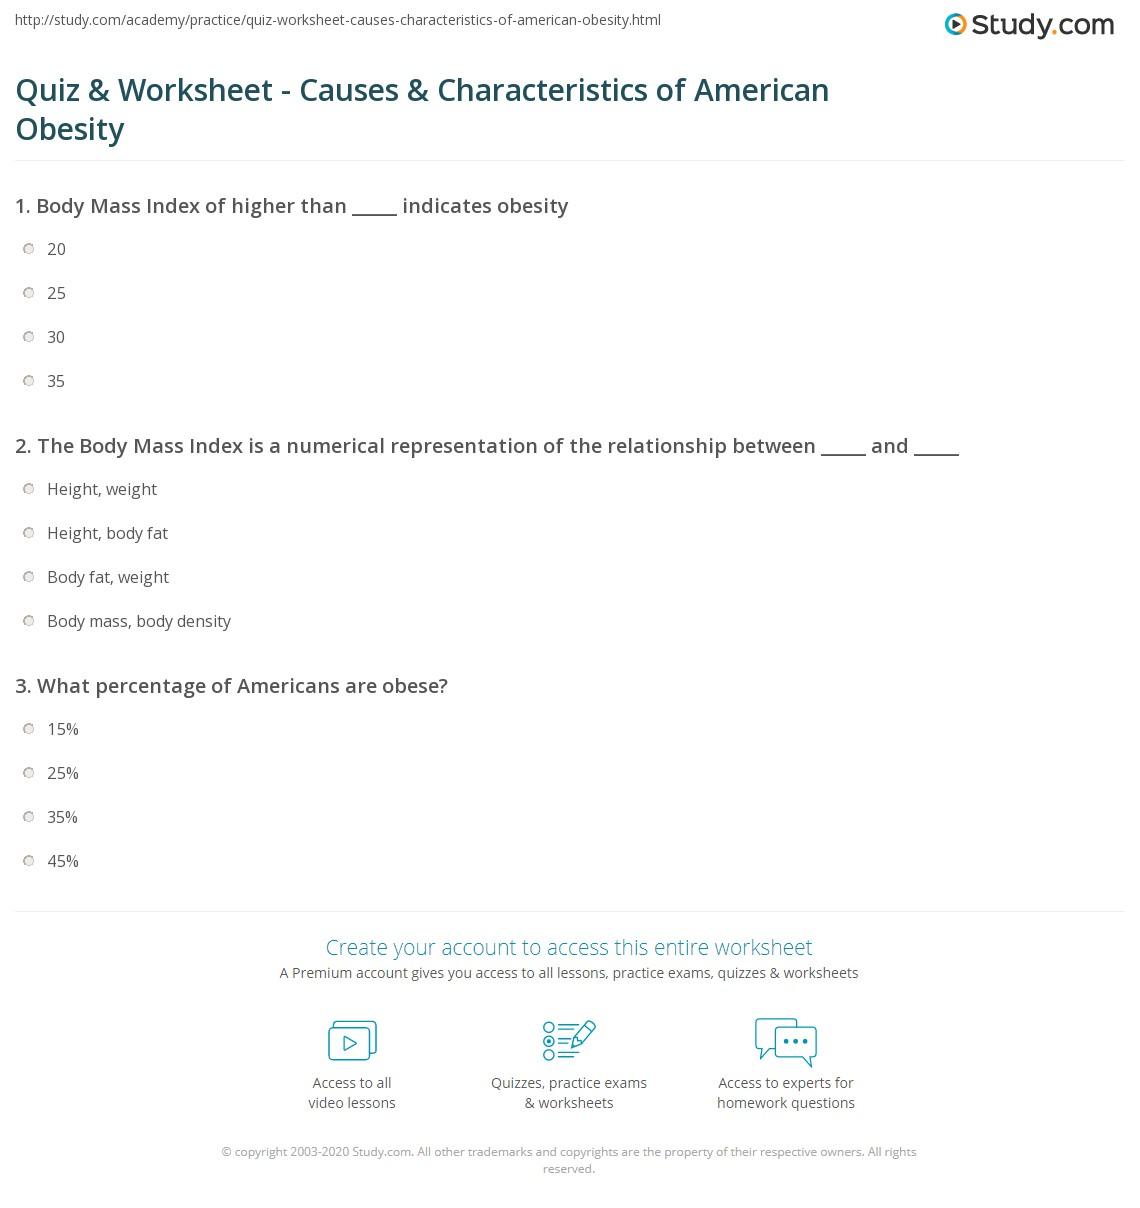 Quiz & Worksheet - Causes & Characteristics of American Obesity